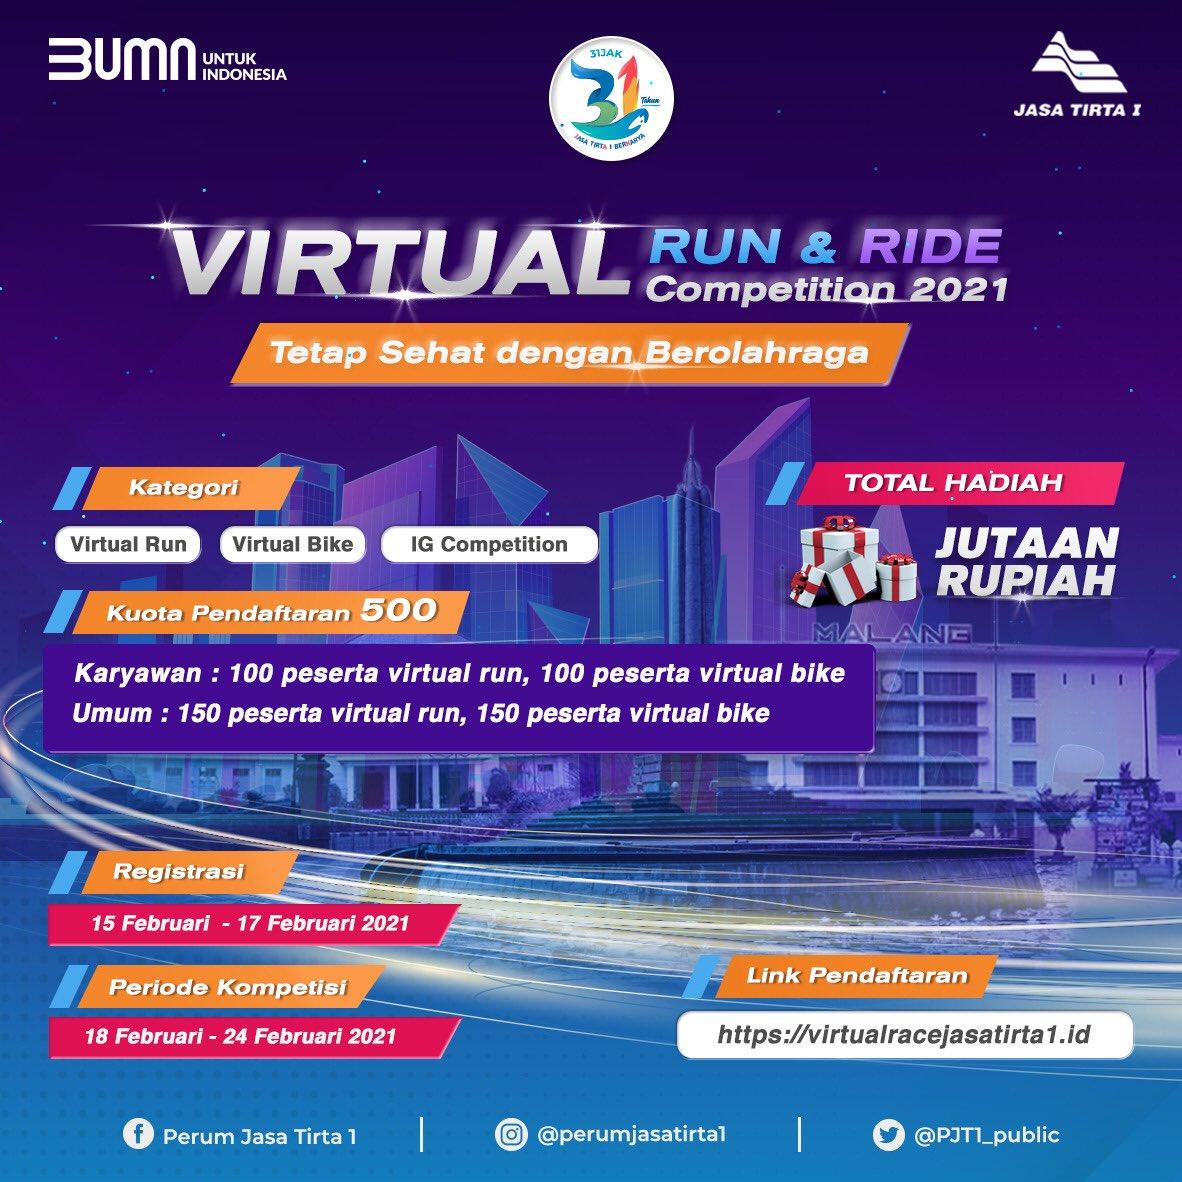 Jasa Tirta I Virtual Race • 2021